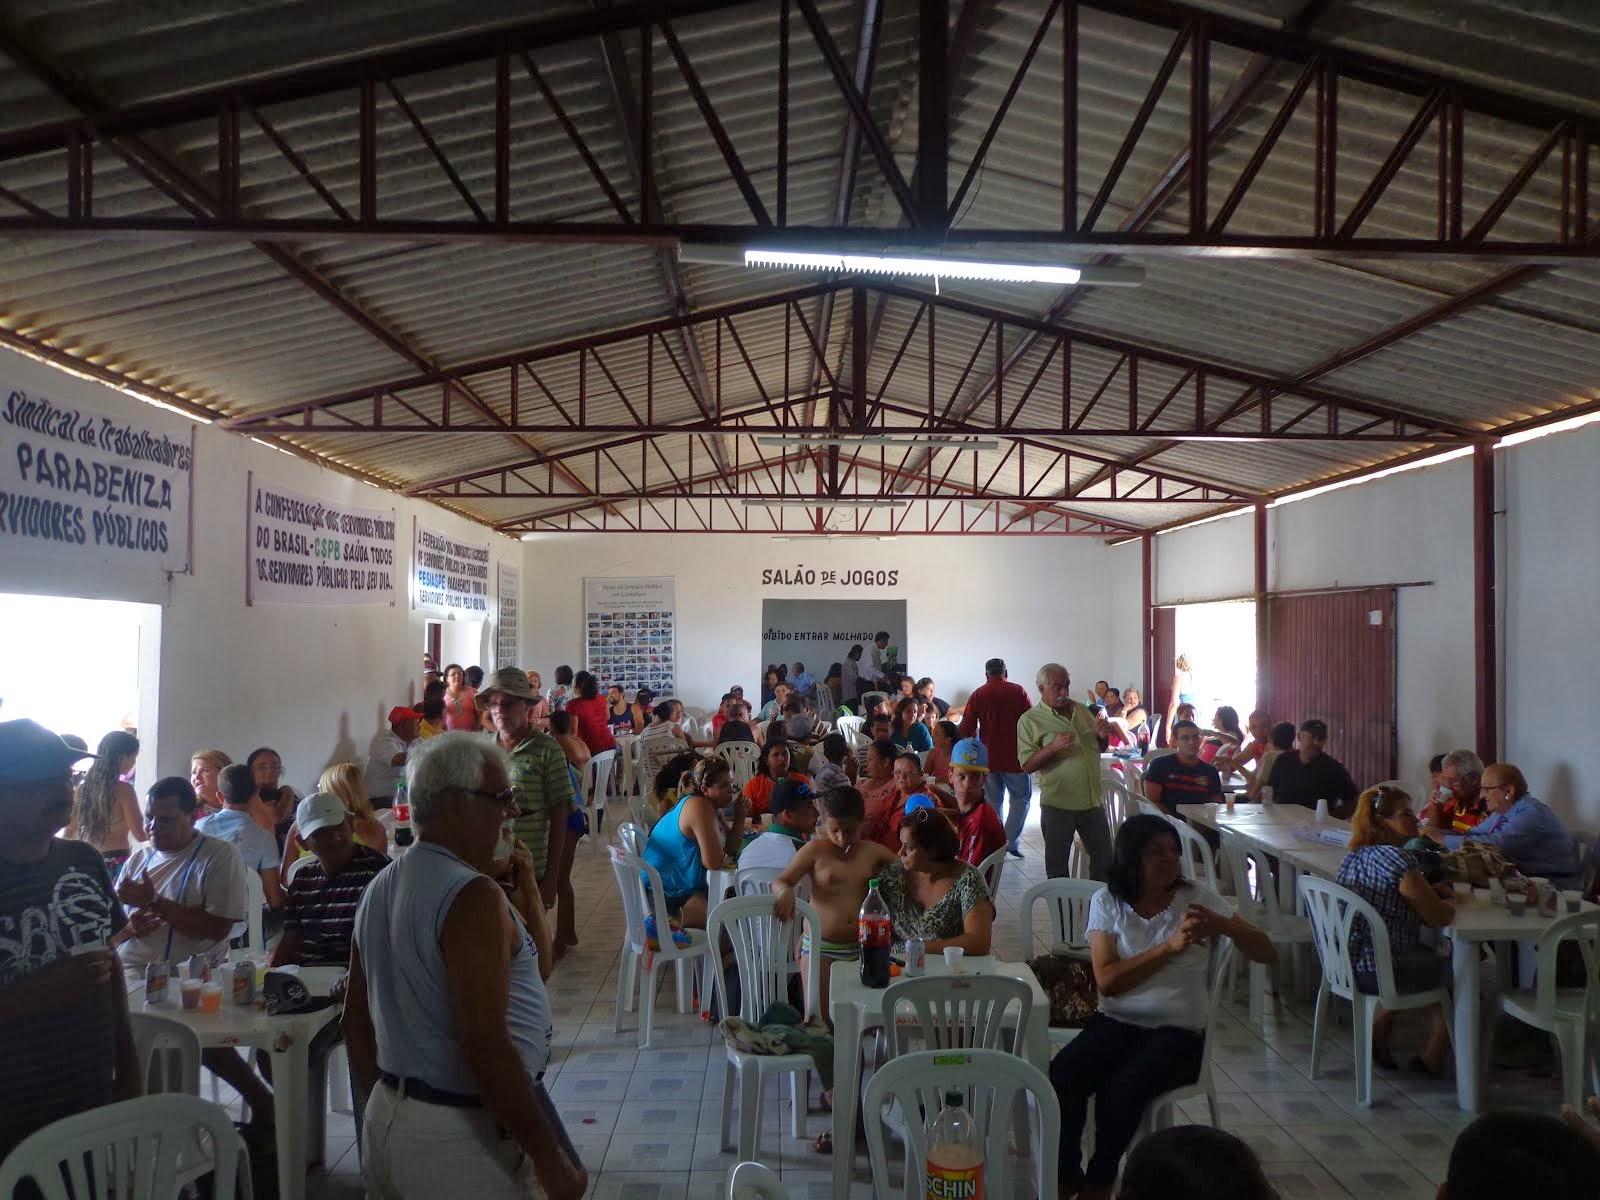 FESTA DO SERVIDOR PÚBLICO 2013